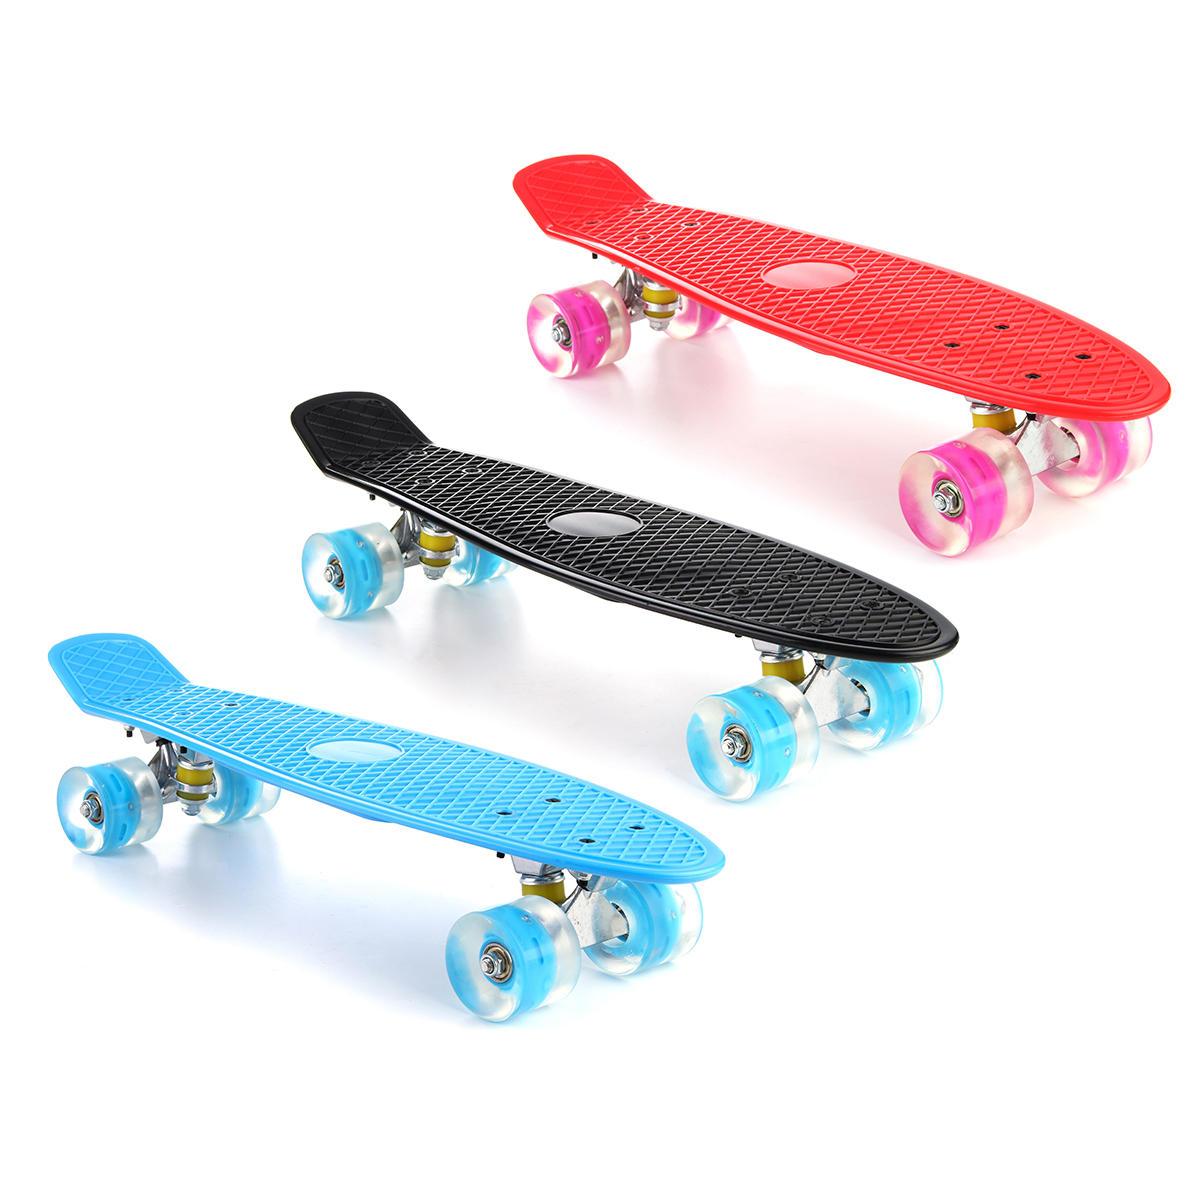 ff8fb47e13 22'' LED Light Up Fish Skateboard 4 PU Wheel Single Warping Board Teenagers  Kids Skateboard